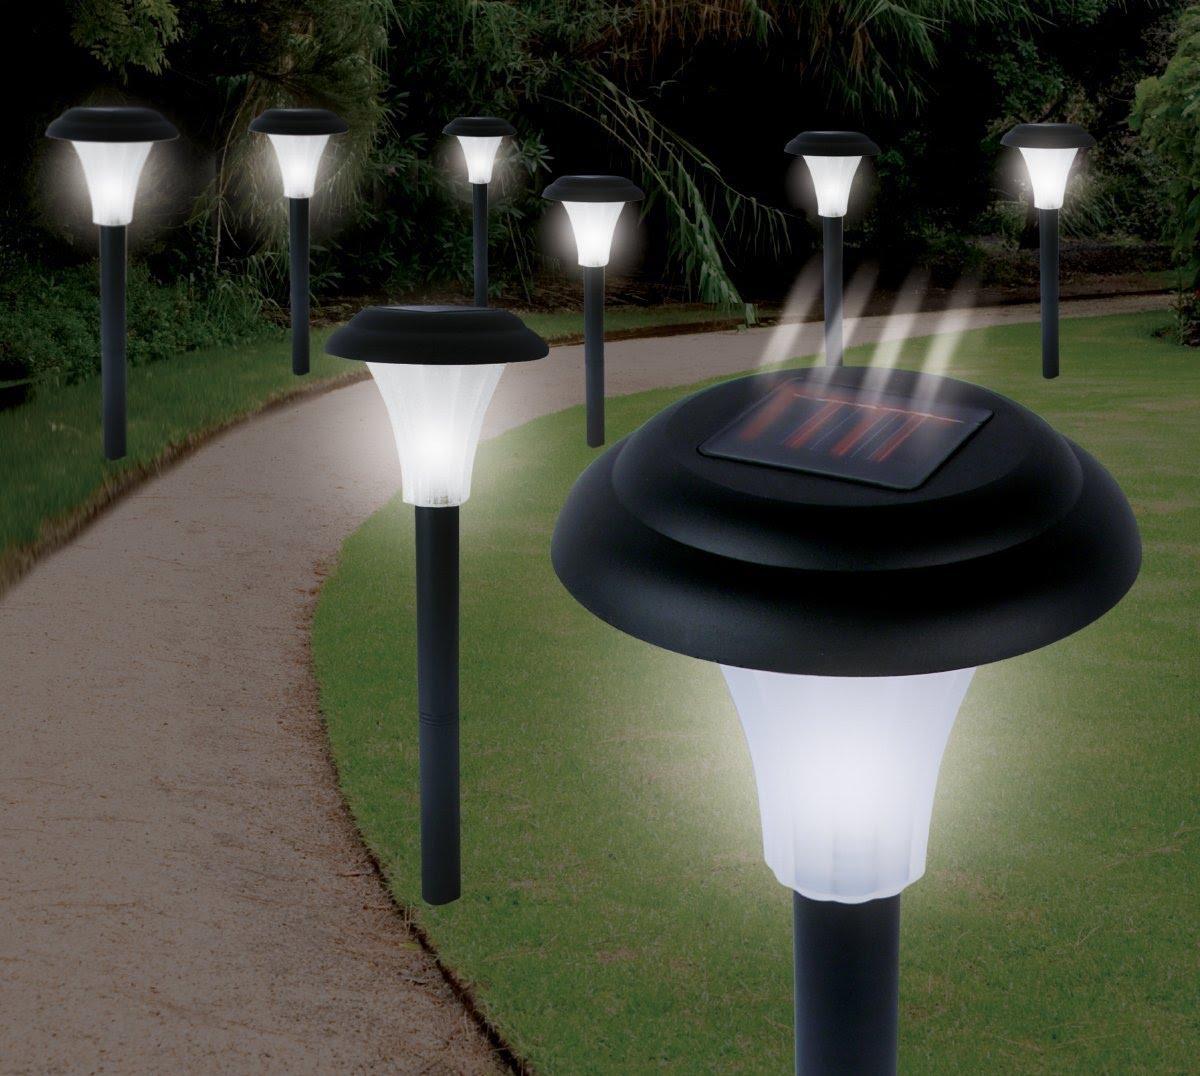 LED Accent Light Set